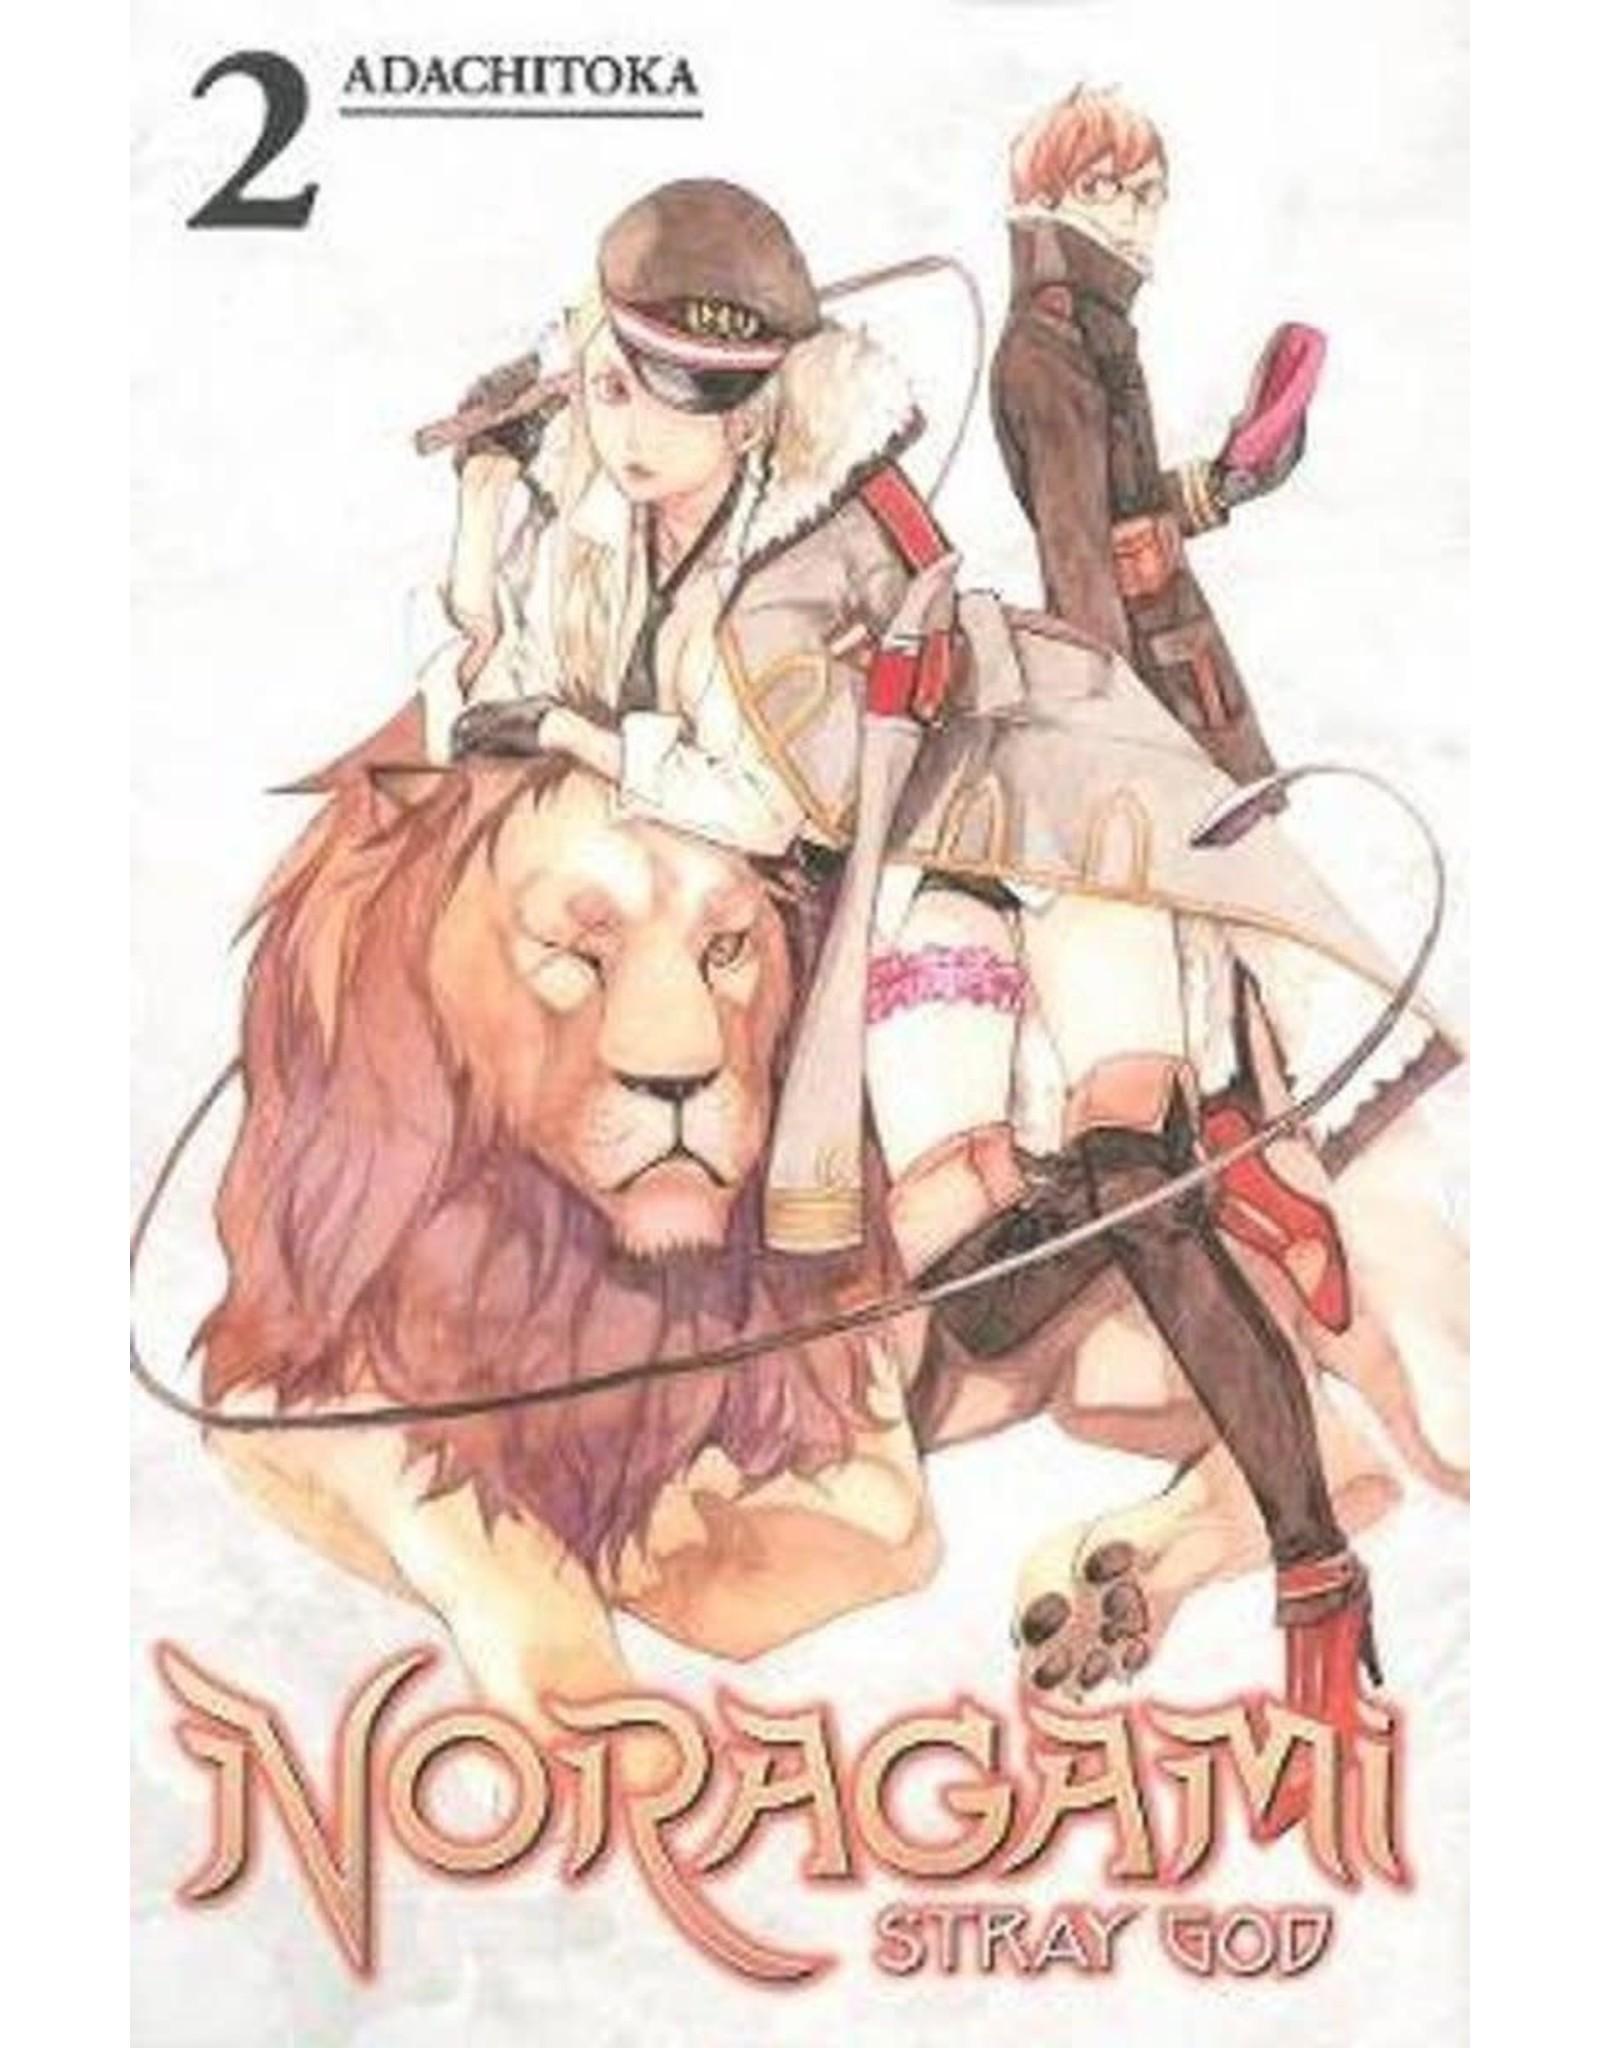 Noragami: Stray God 02 (Engelstalig) - Manga